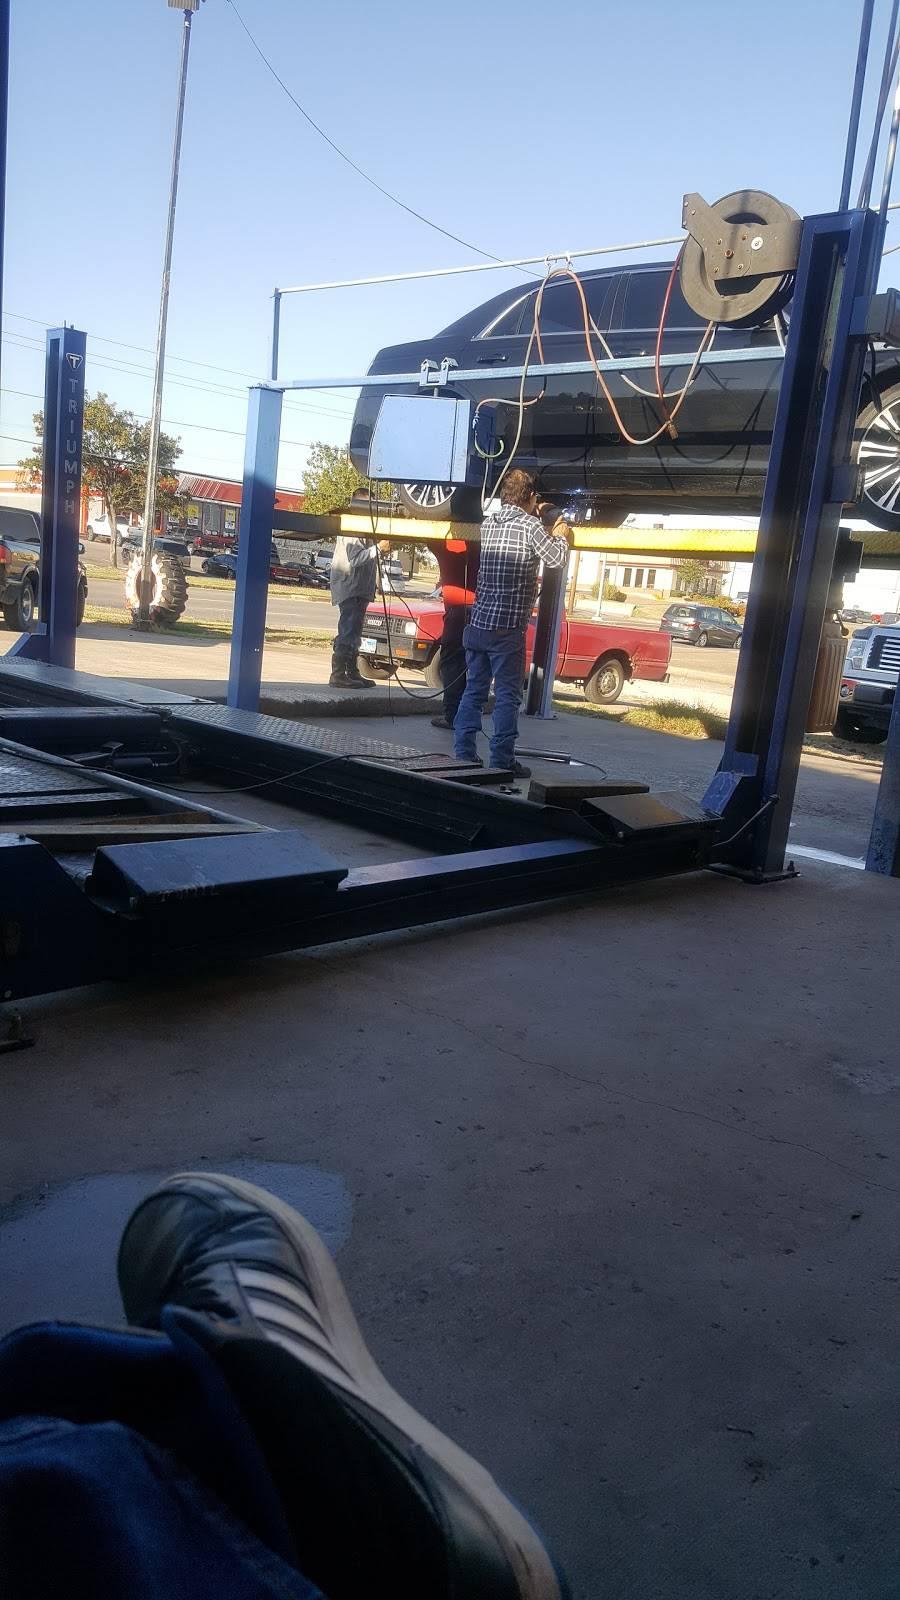 Santos Radiator & Muffler - car repair  | Photo 1 of 2 | Address: 2000 Fort Worth Ave, Dallas, TX 75208, USA | Phone: (214) 942-6265